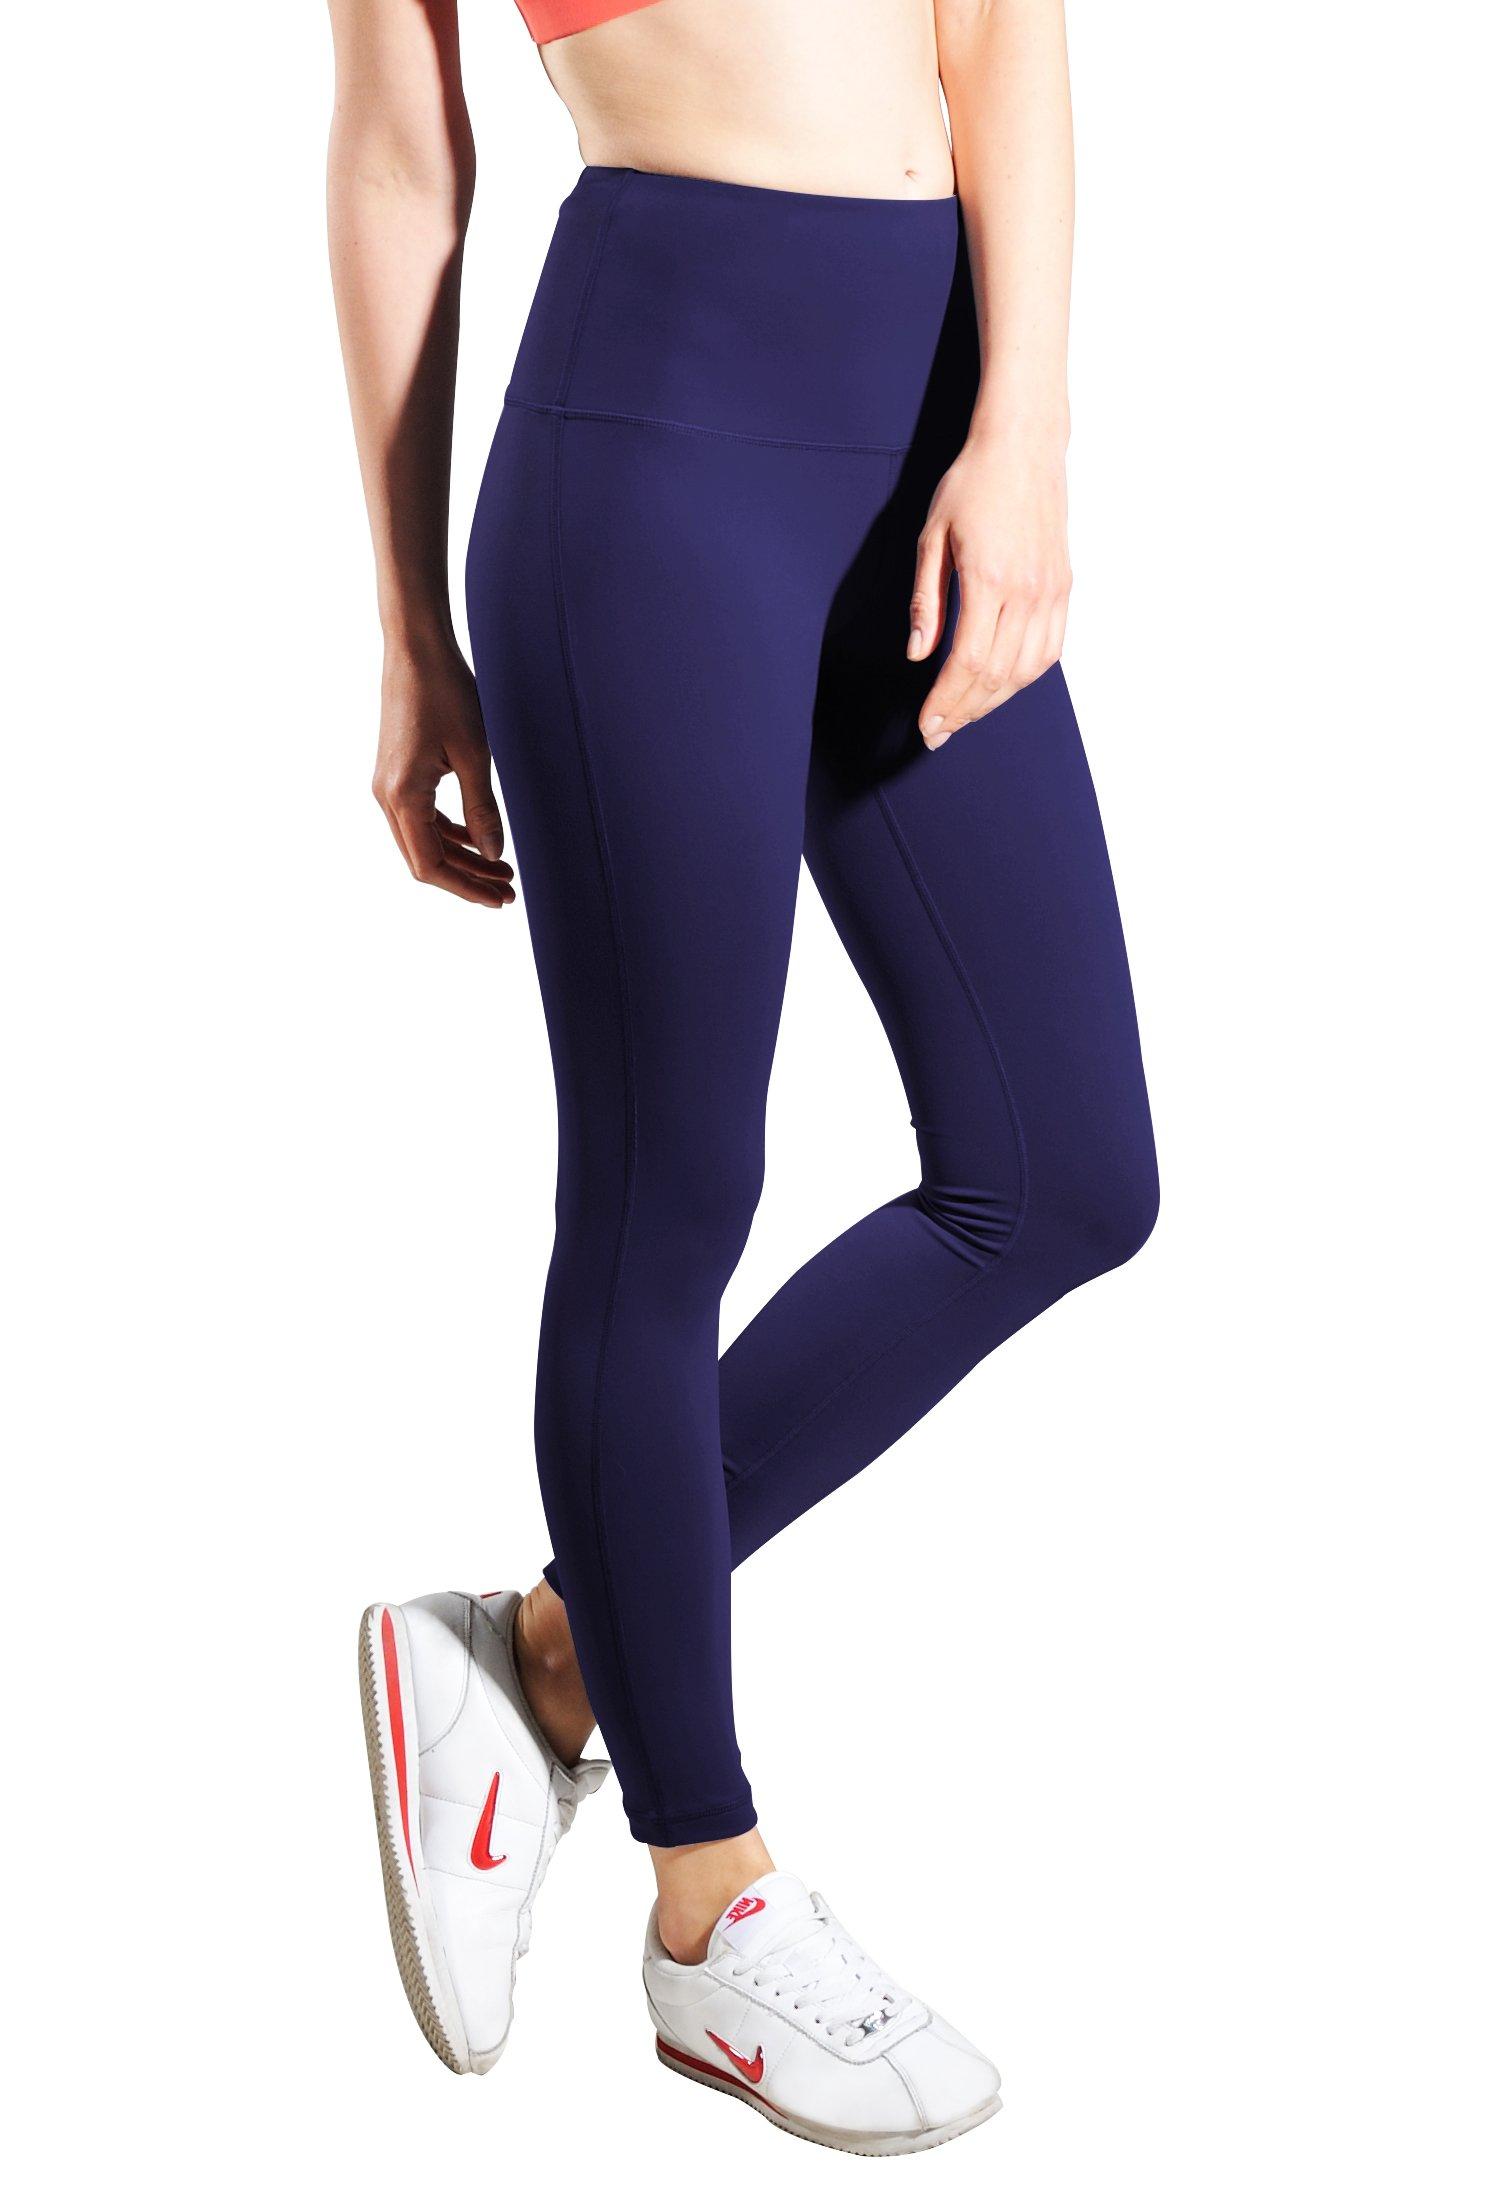 Queenie Ke Women Mid-Waist Phone Back Pockets Sport Legging Yoga Pants Running Tights Size XS Color Dark Indigo